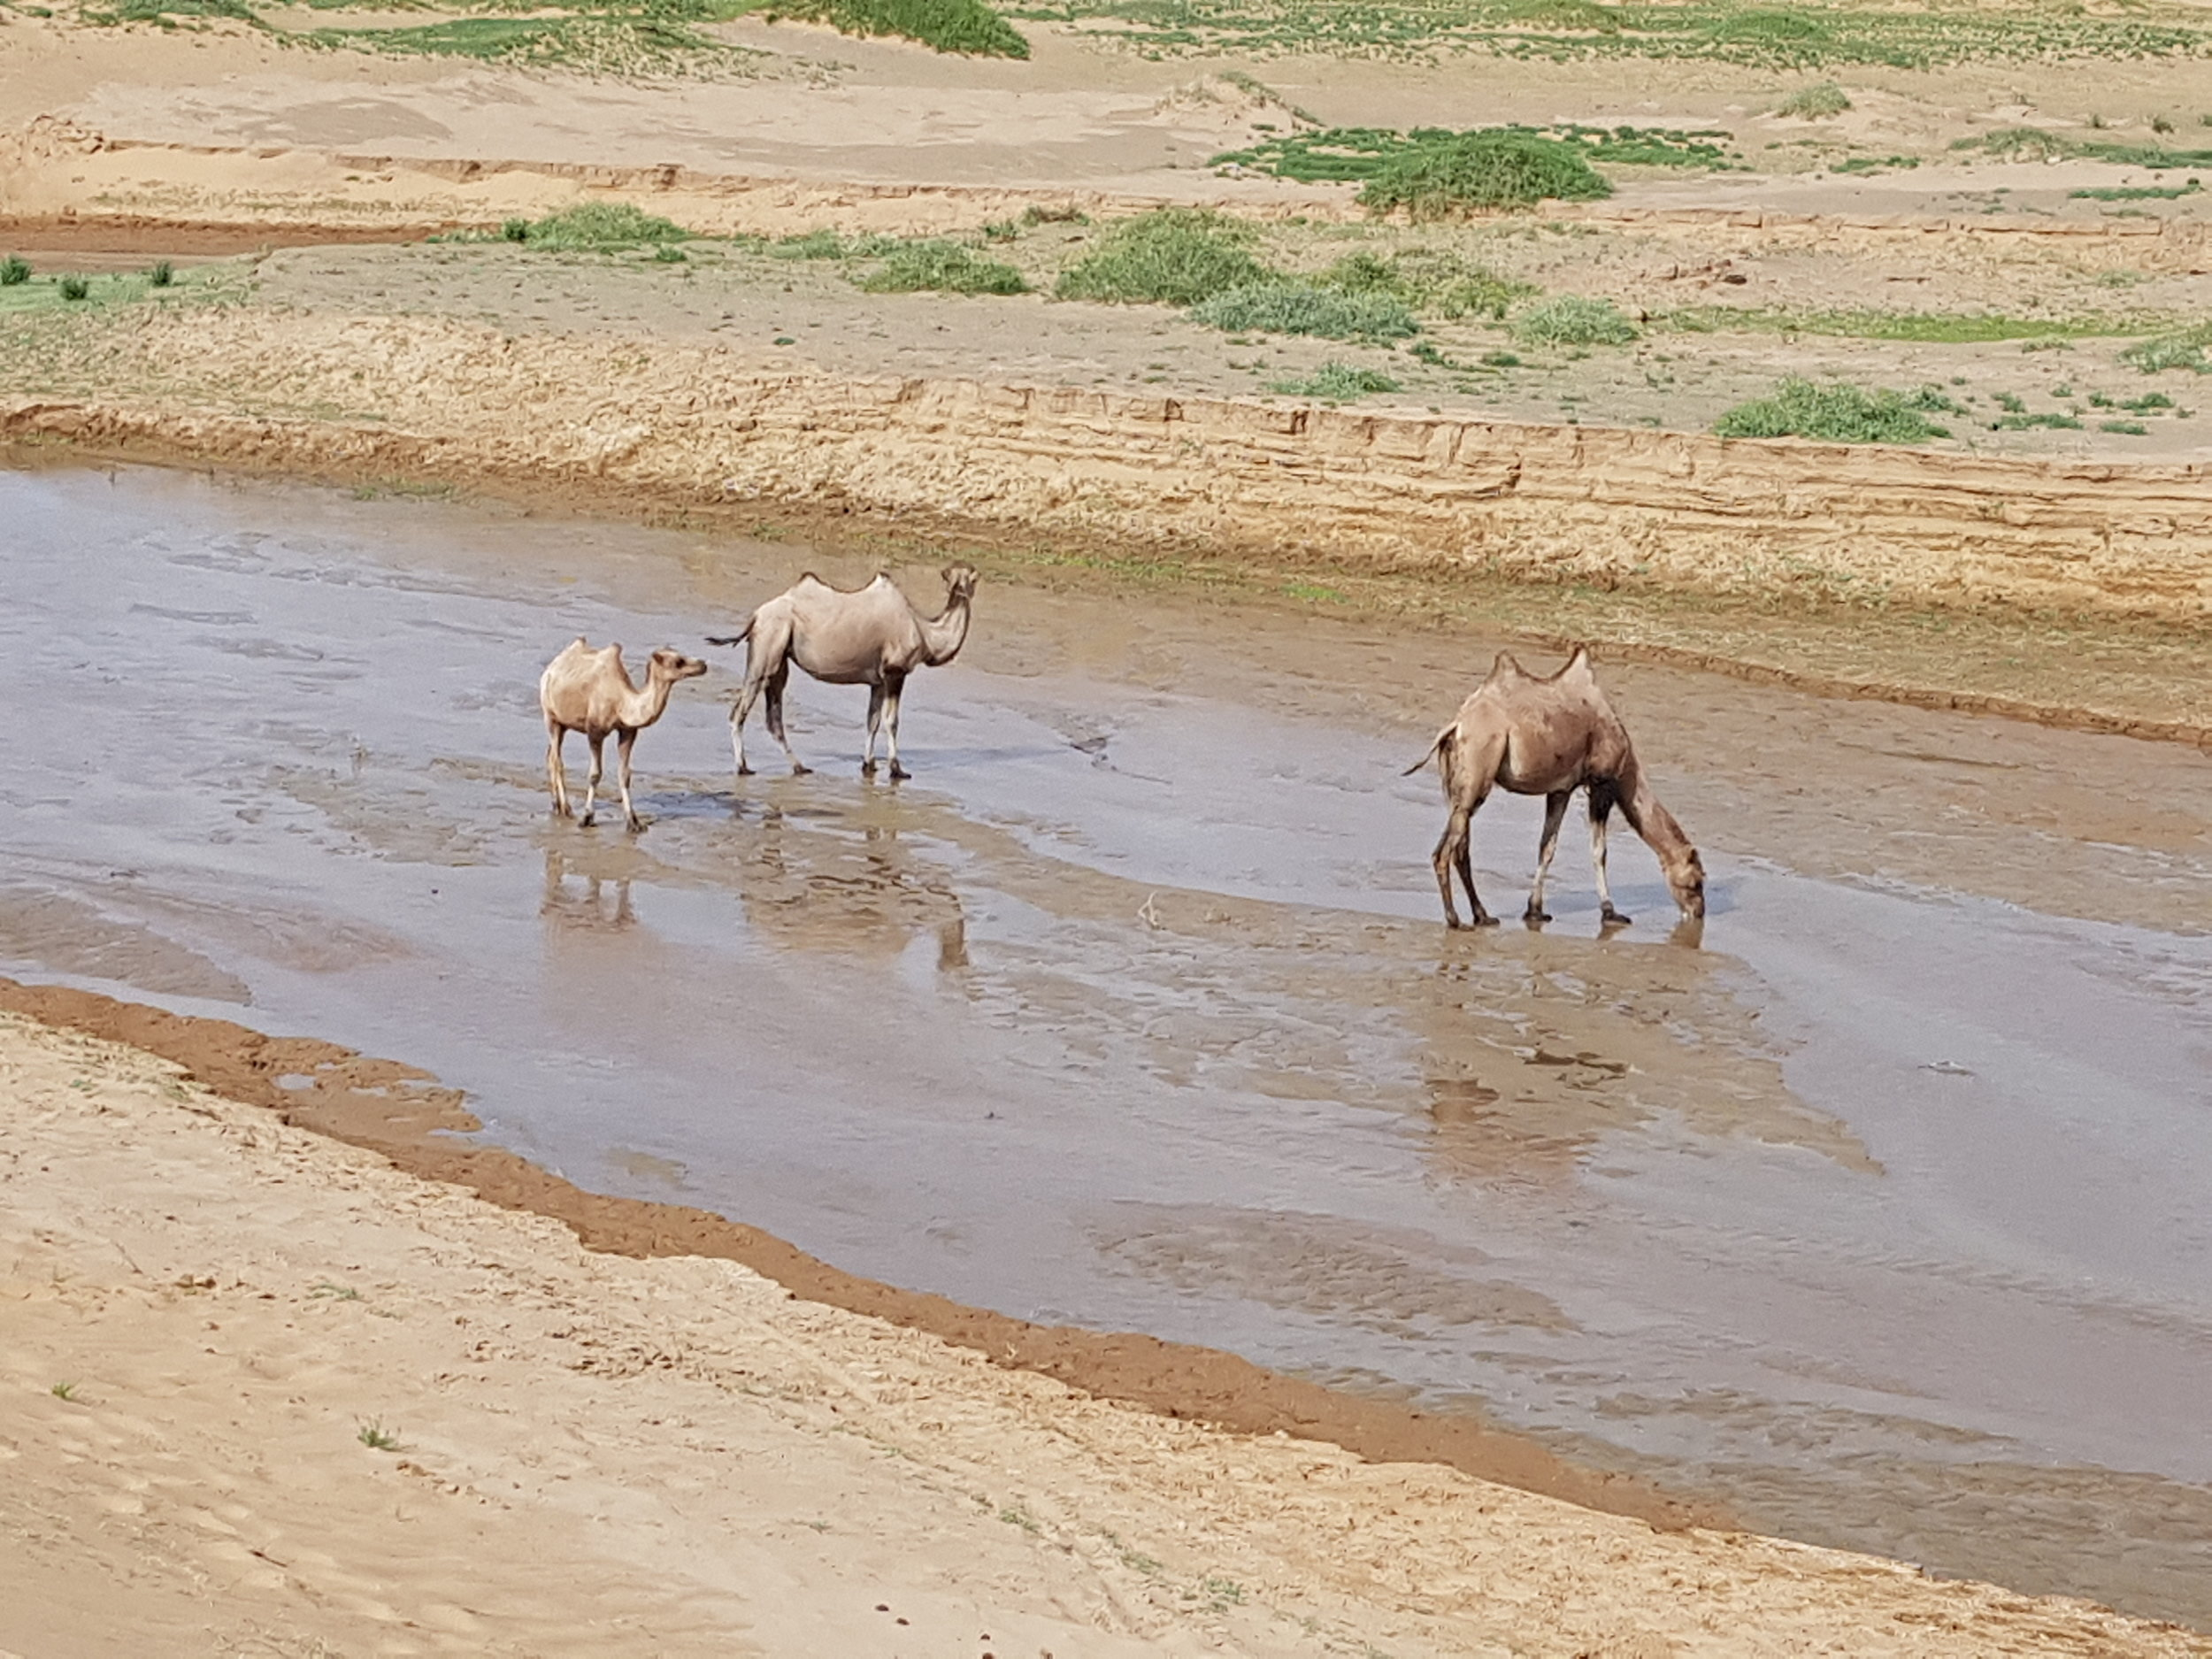 Bactrian camels drinking in the Gobi Desert